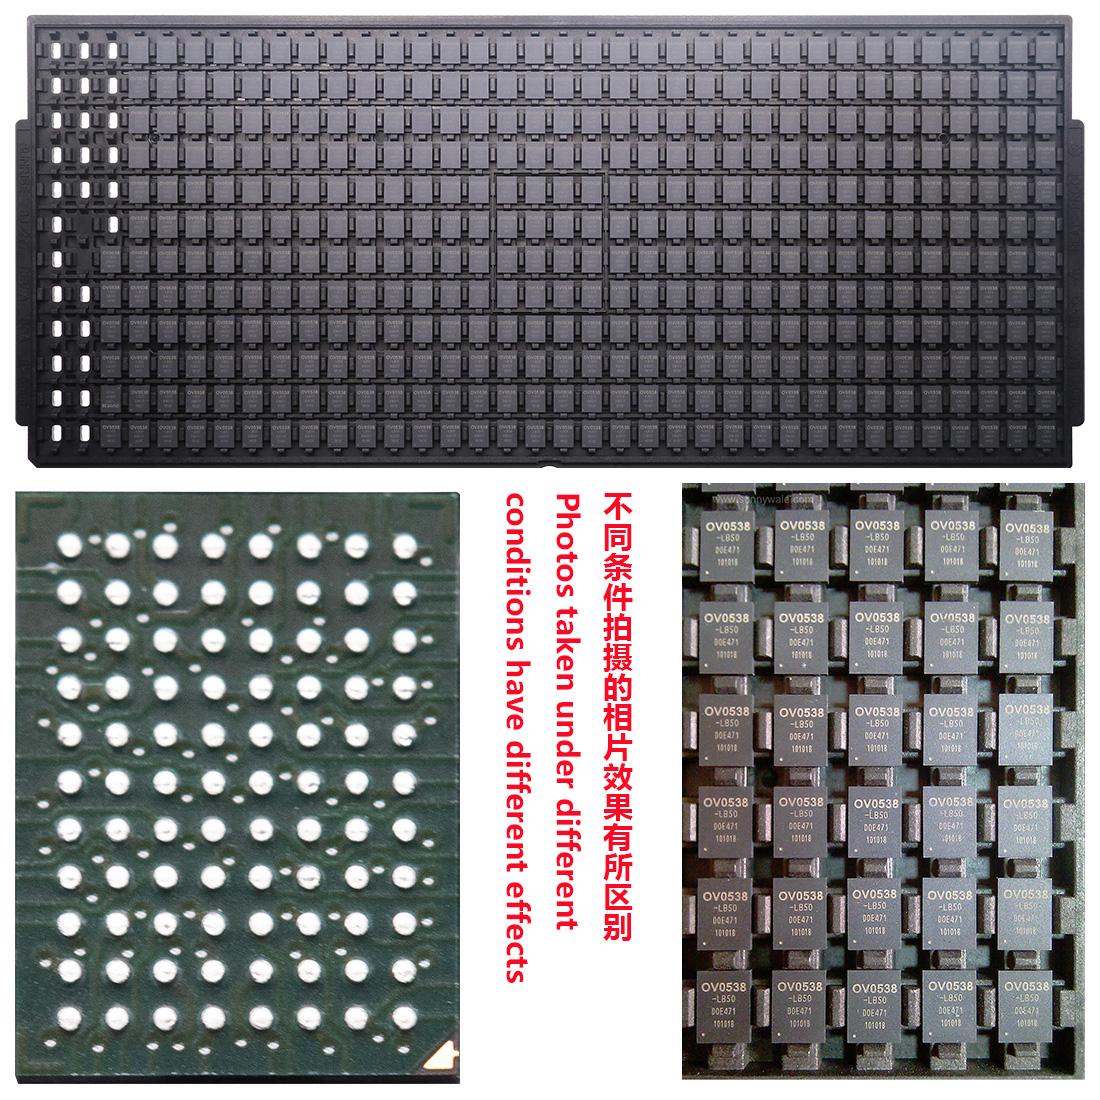 OV538-B88,OV538-LB50,OV00538-B88G,Camera Bridge Processor,camera single-chip,USB2.0 camera system,suport 2MP camera,摄像机桥处理器单片机,集成USB 2.0摄像头系统的单片机